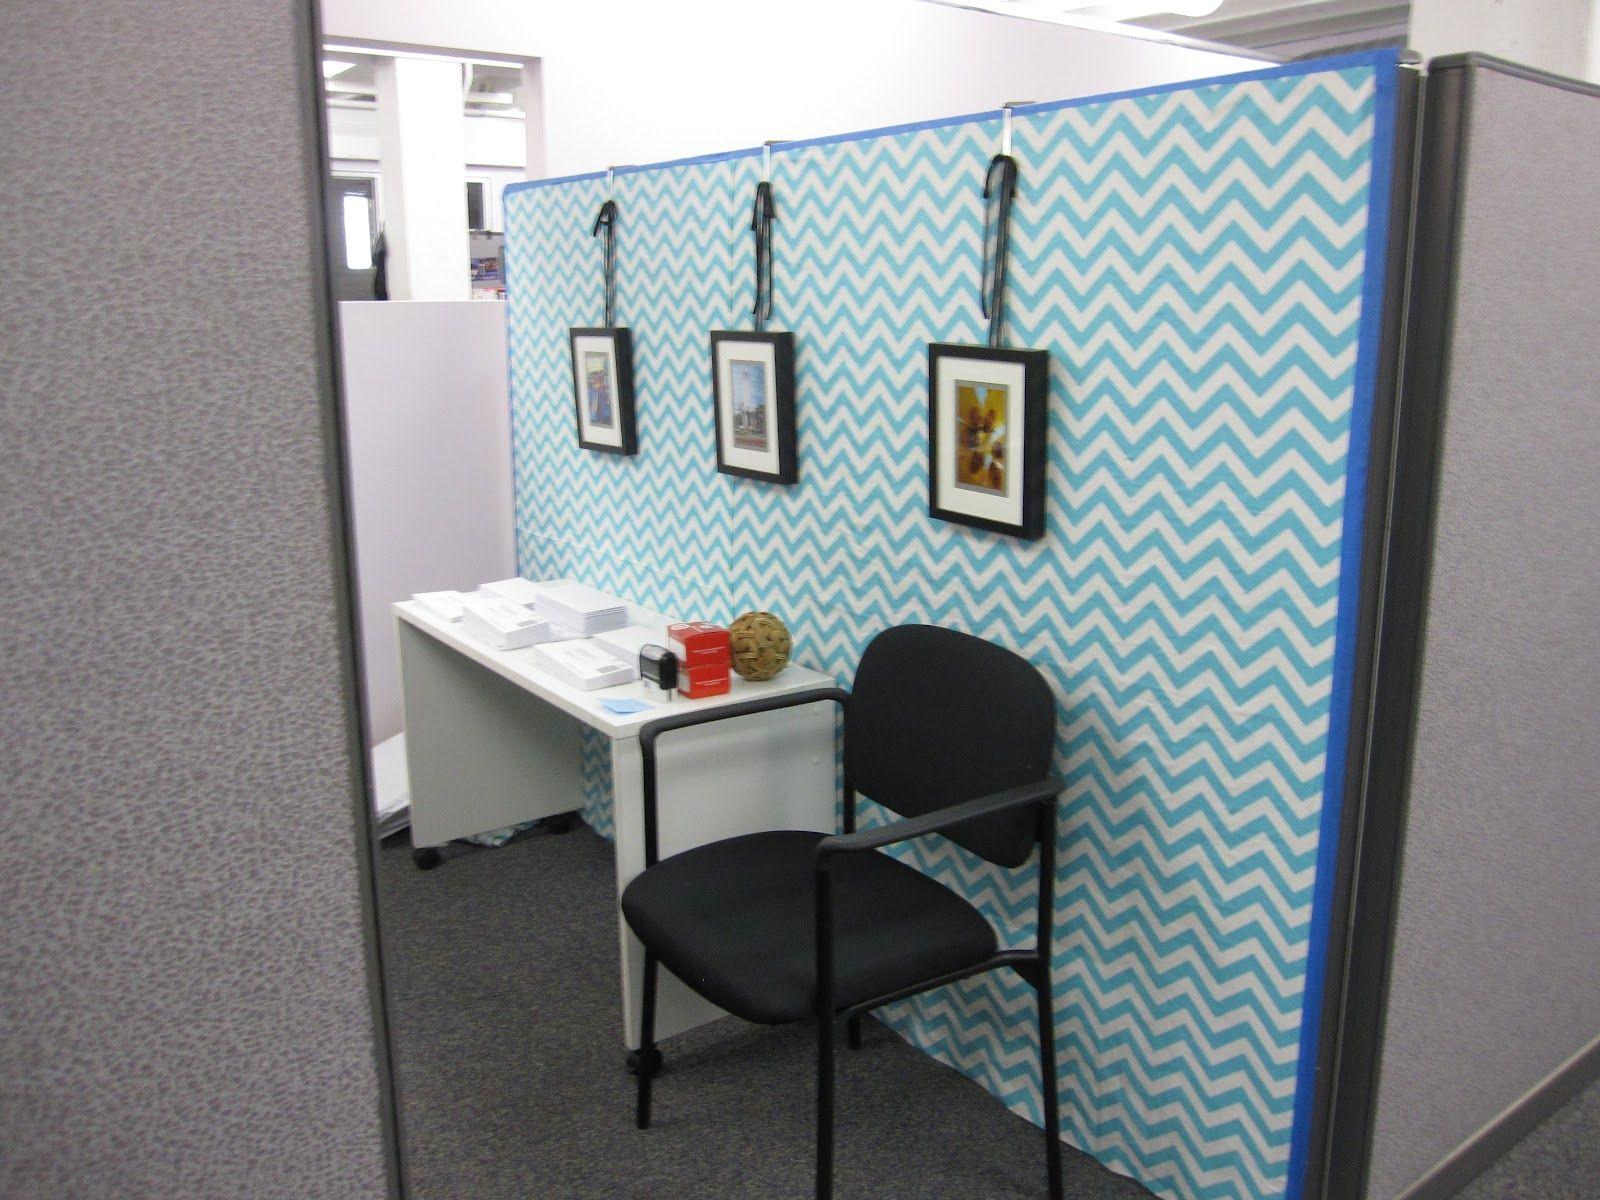 Cubicle Wall Hangers Cubicle Design Cubicle Decor Cubicle Walls